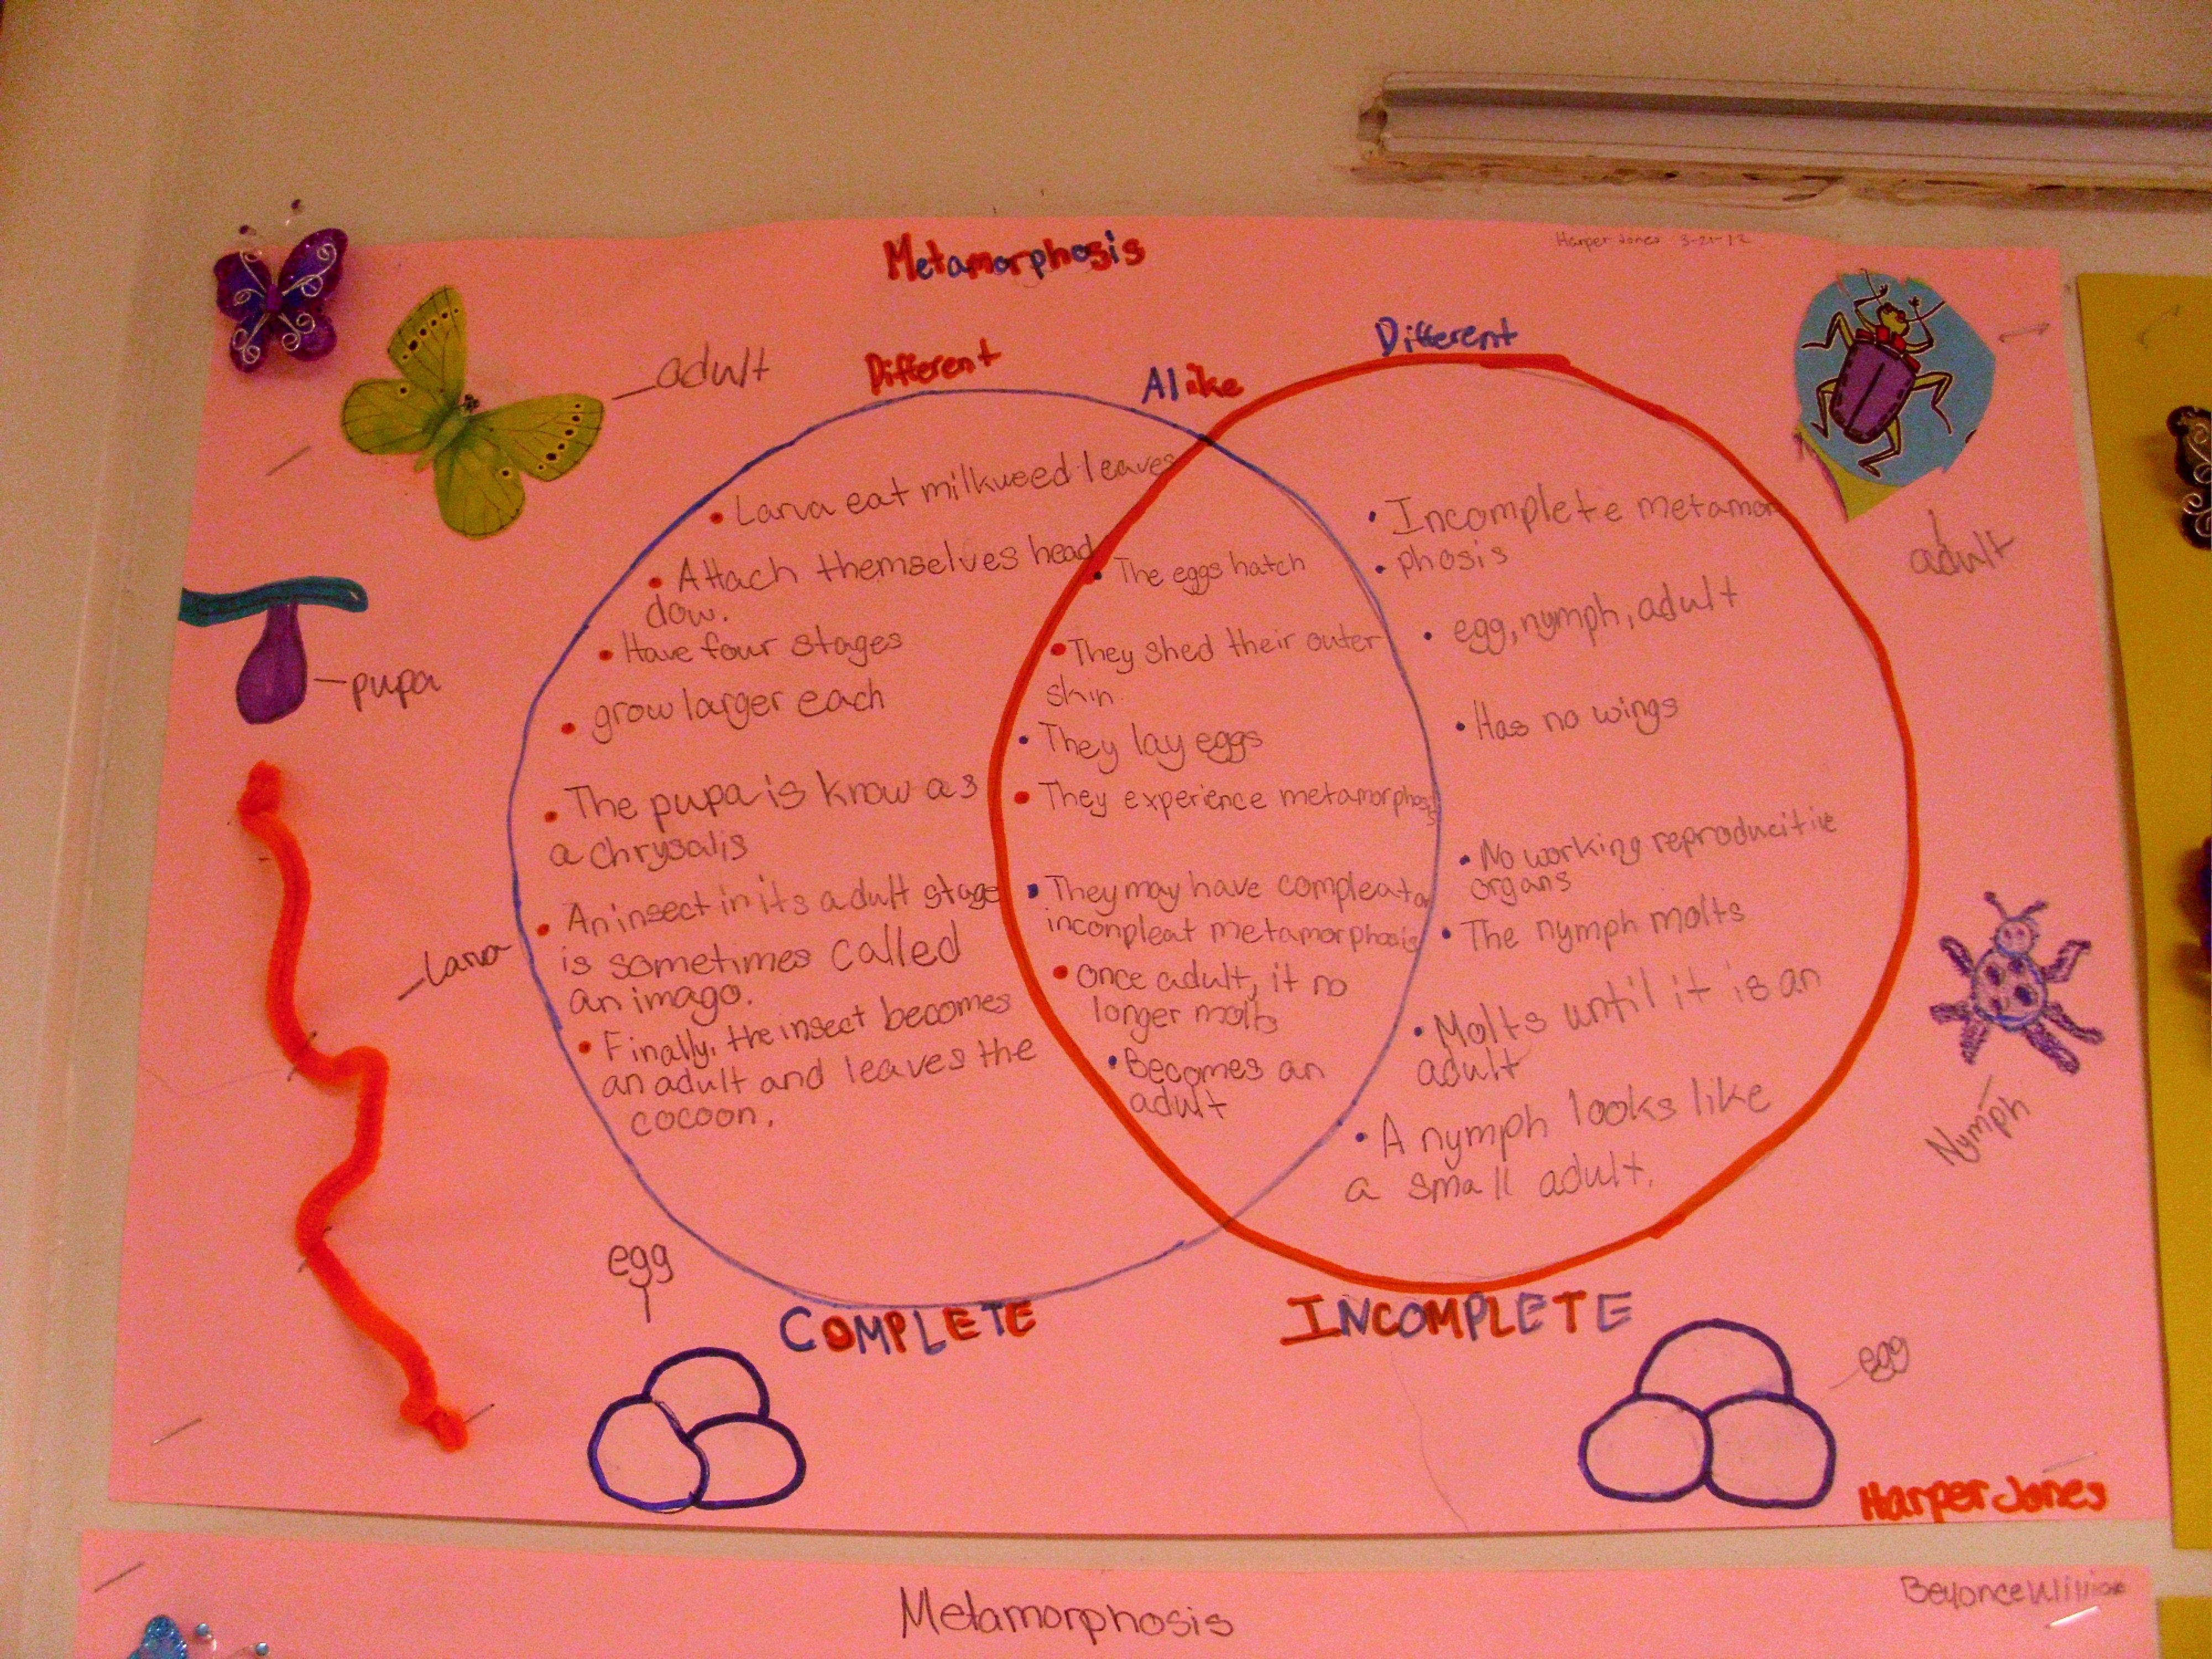 complete the venn diagram complete and incomplete metamorphosis venn diagram